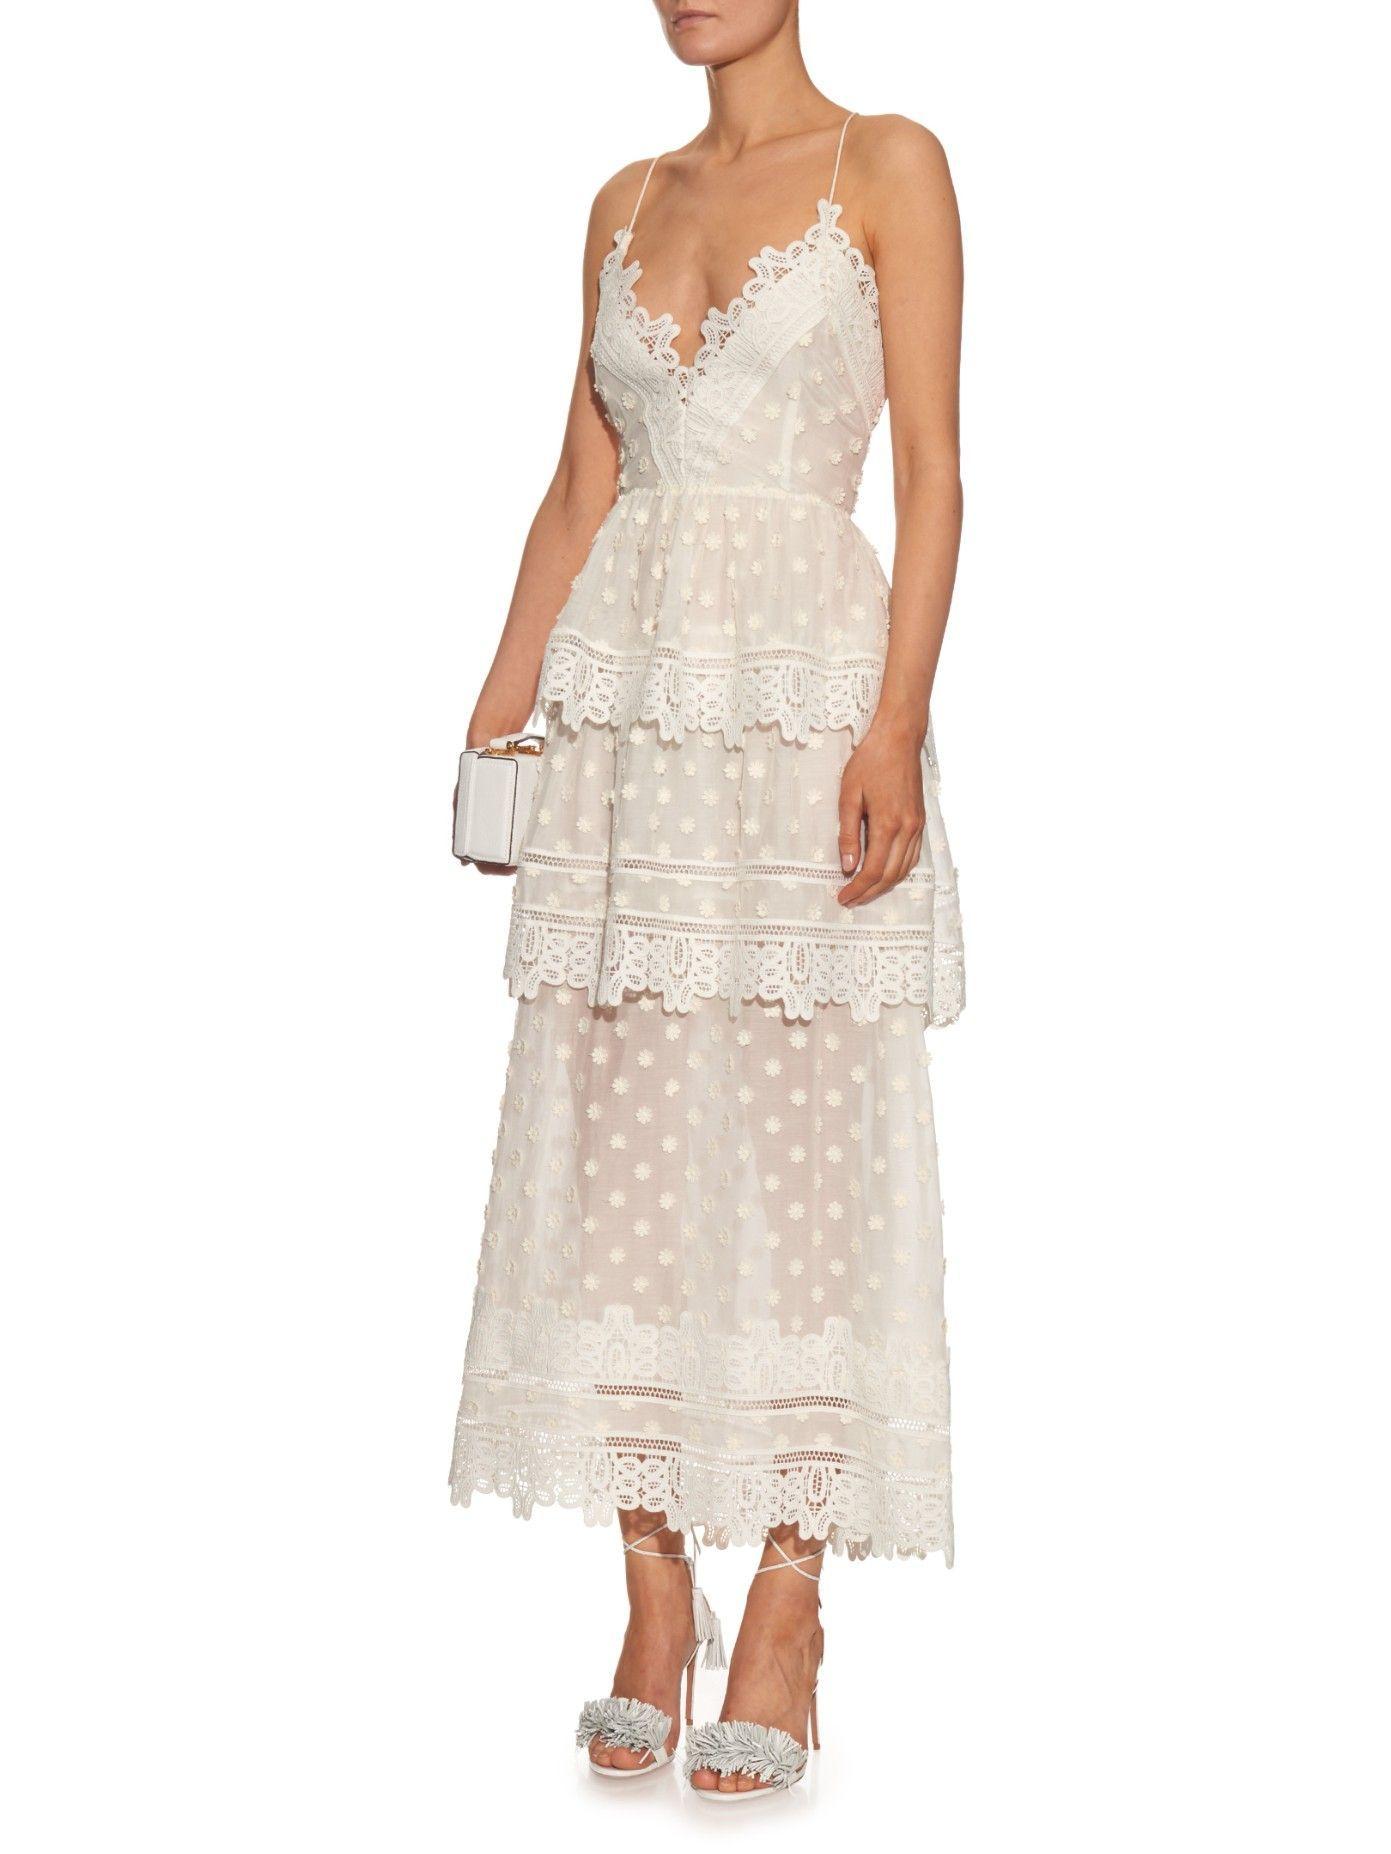 Tiered Lace Midi Dress Self Portrait Matchesfashion Com Dekoration Hausdekoration Hausdekor Wohn Lace Midi Dress Lace White Dress White Lace Midi Dress [ 1854 x 1391 Pixel ]